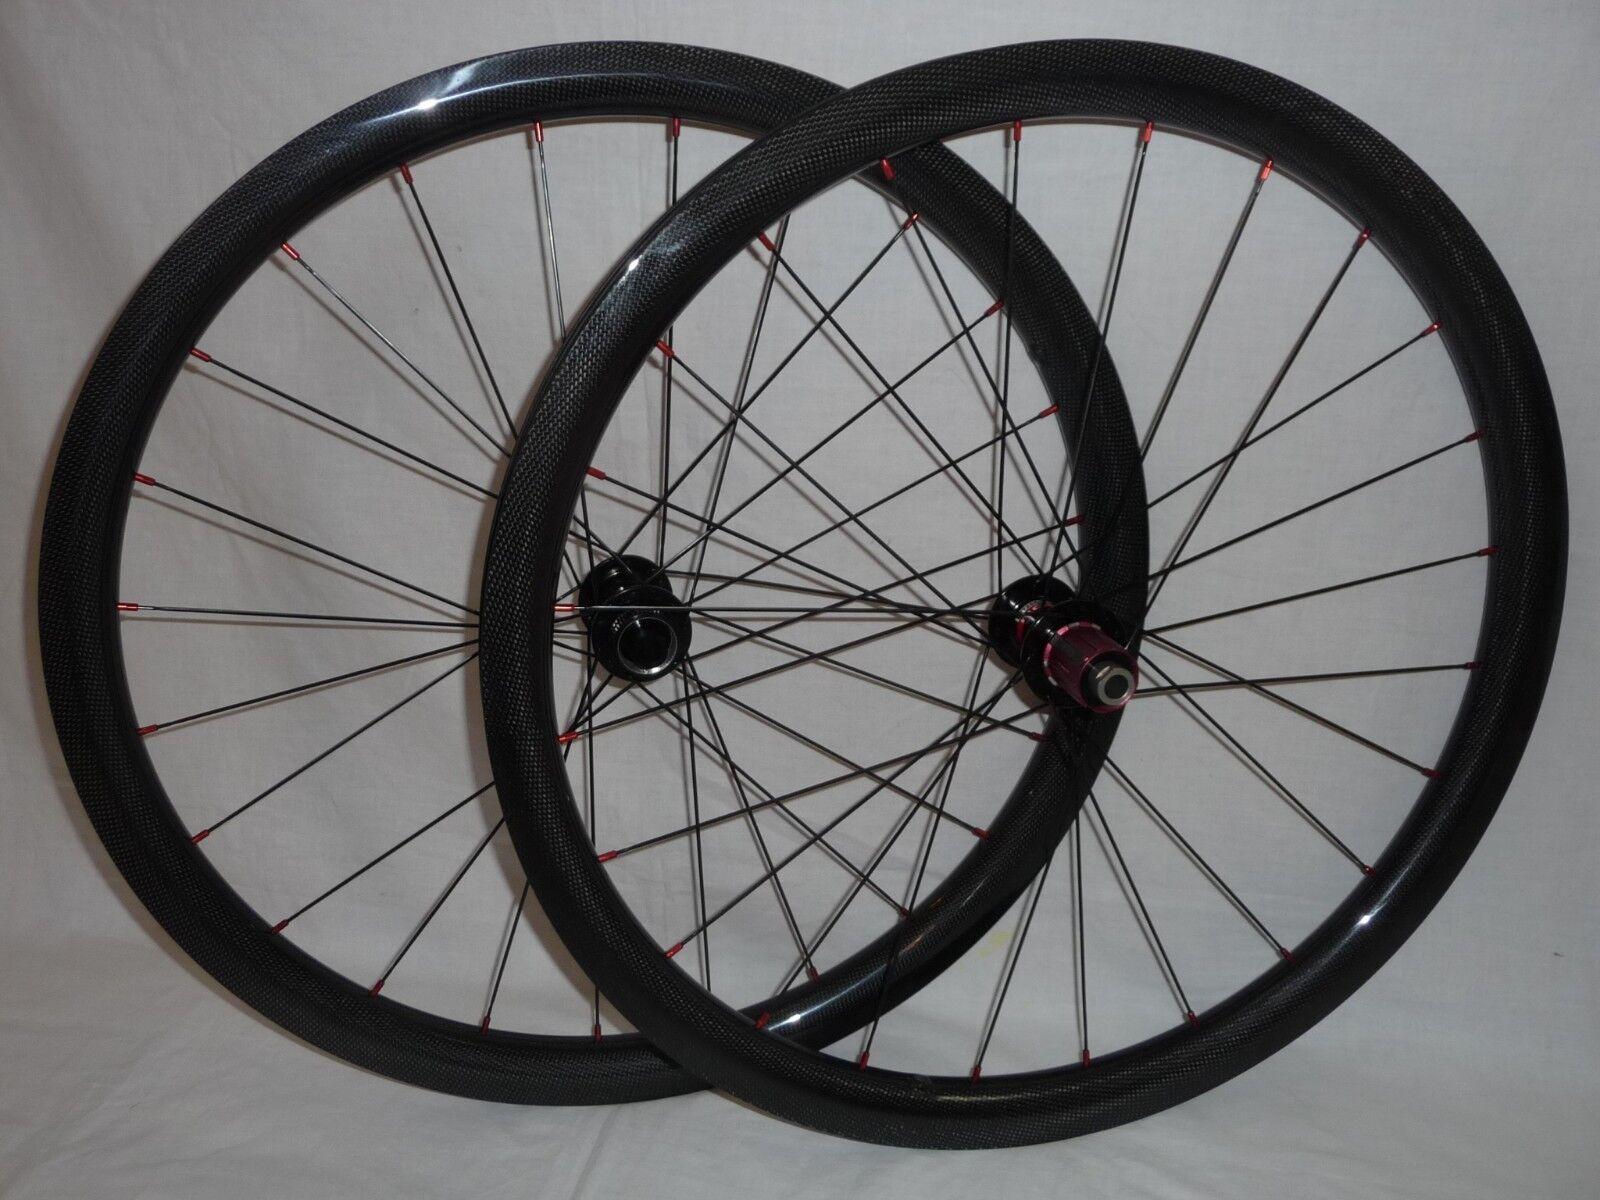 Carbonal  lightweight 35mm wide 650b disc brake wheels for Gravel Road light MTB  100% price guarantee